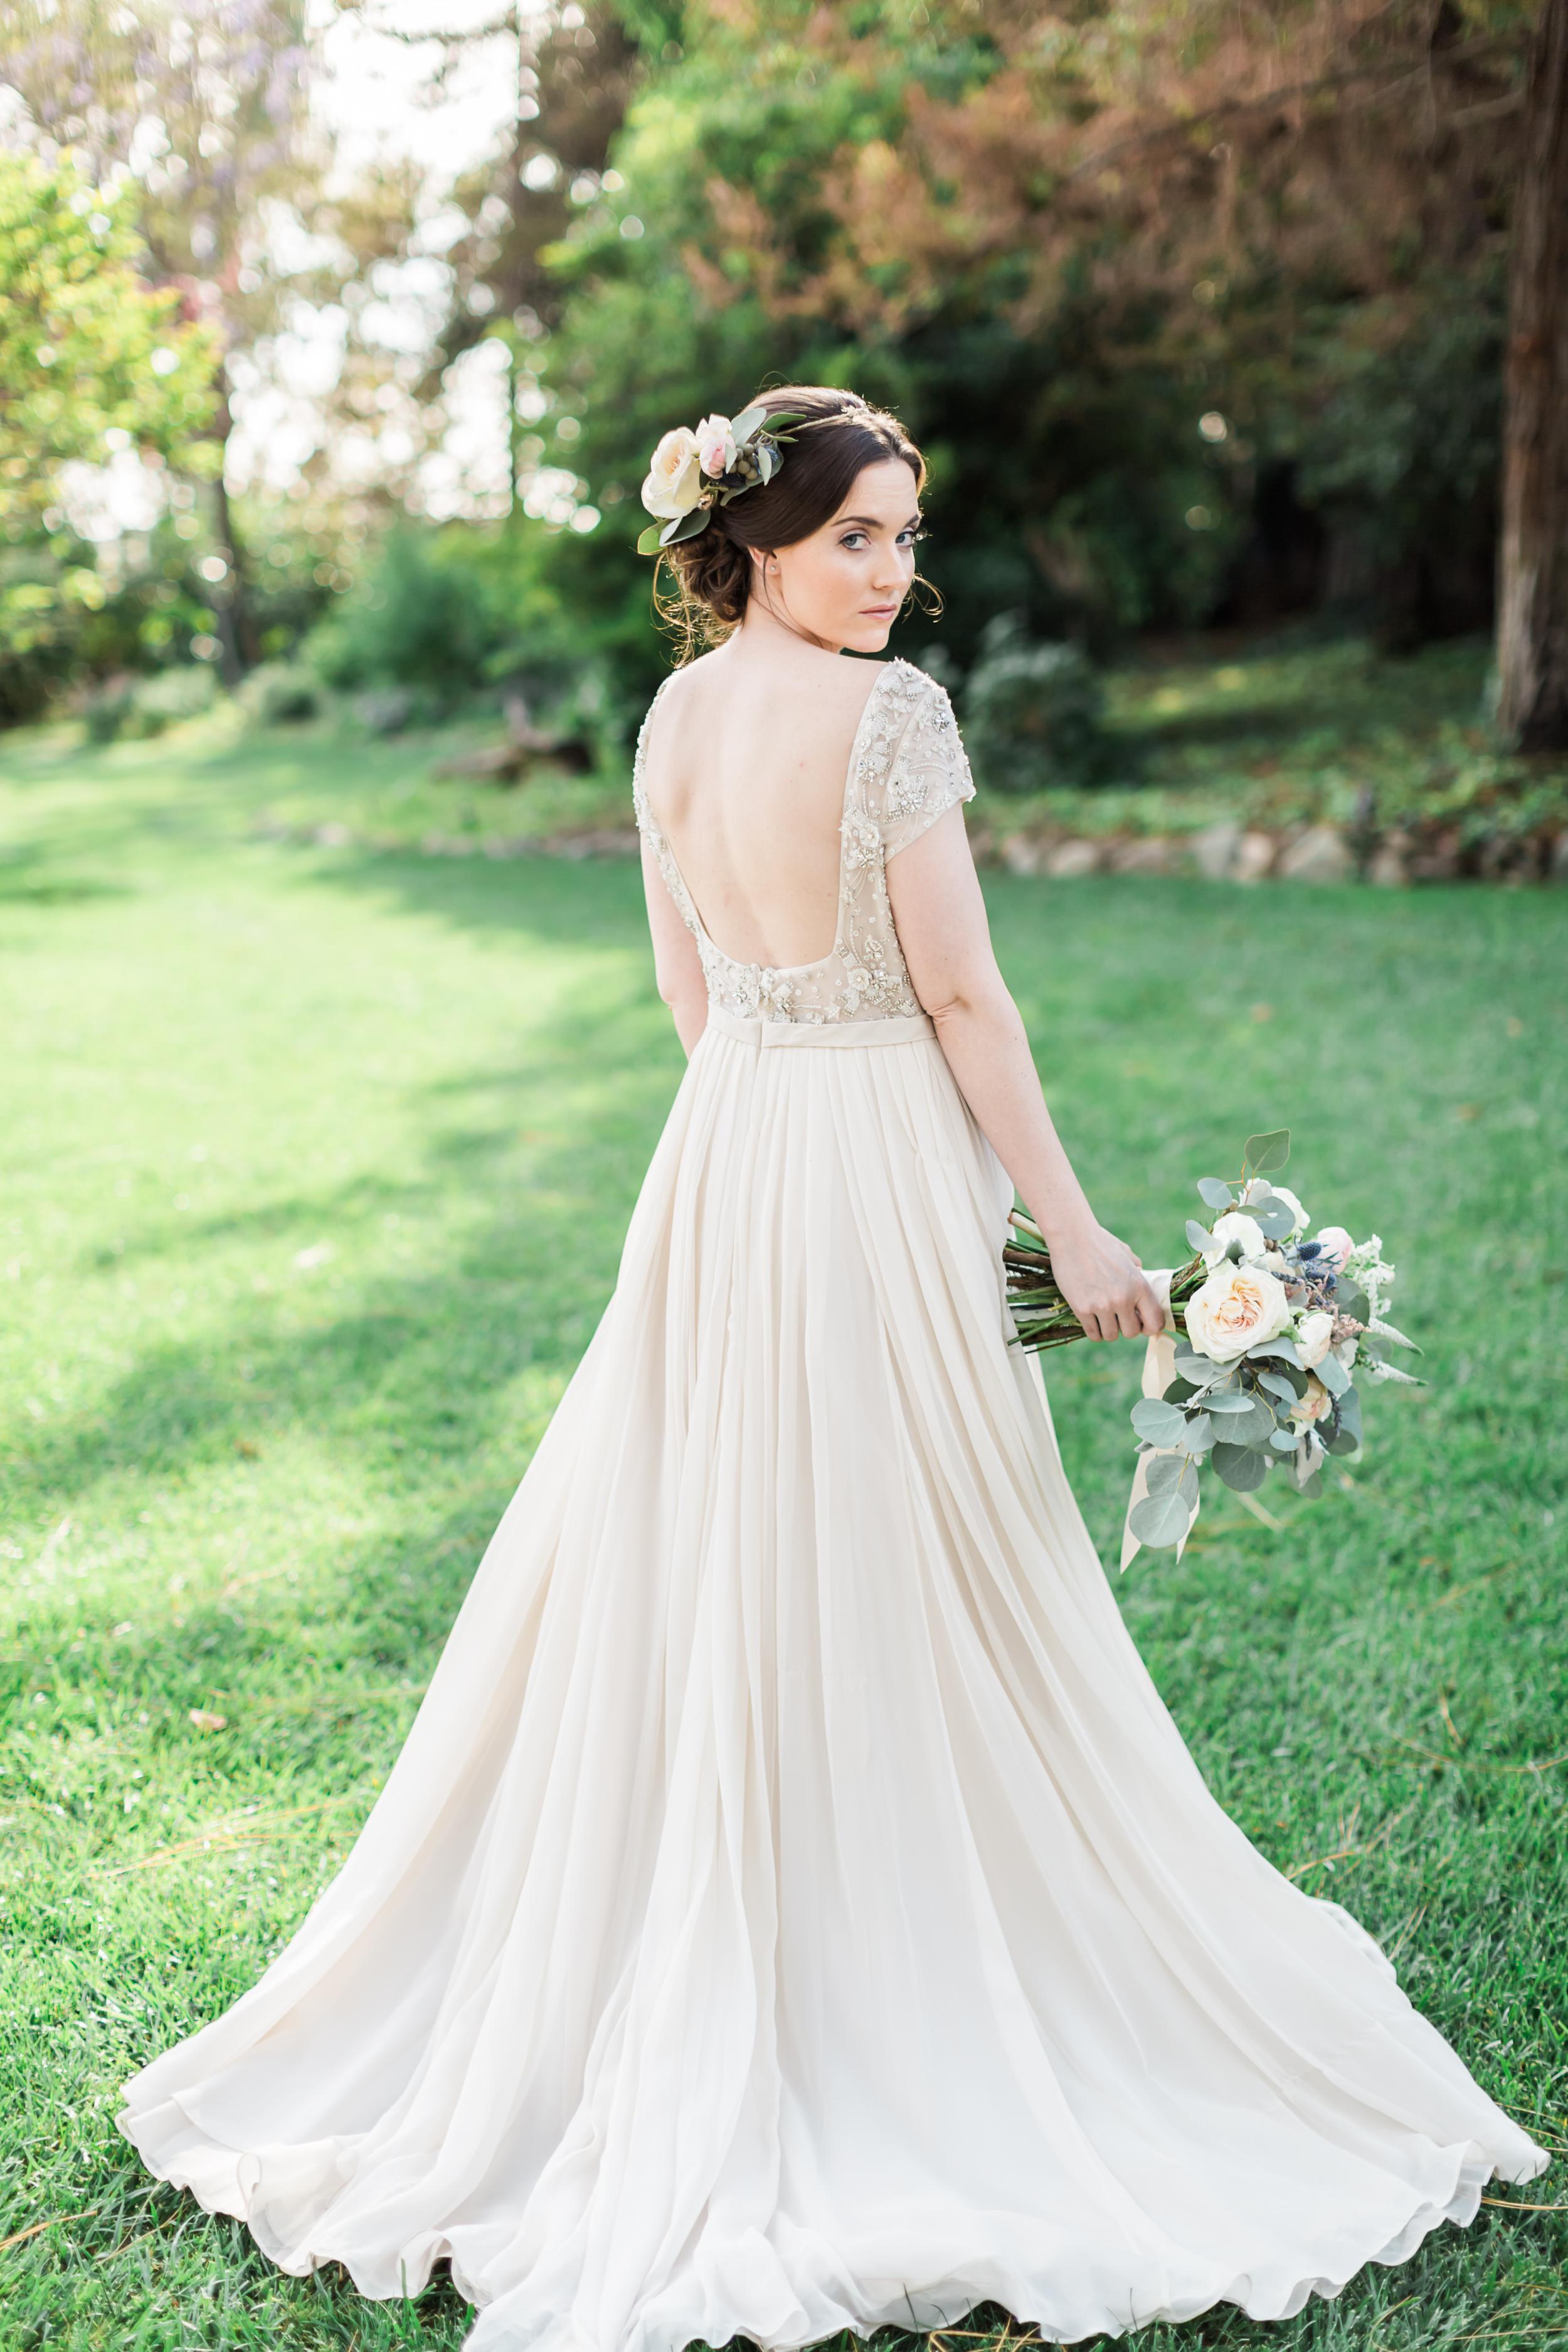 Katie Jackson Photo | JenEvents